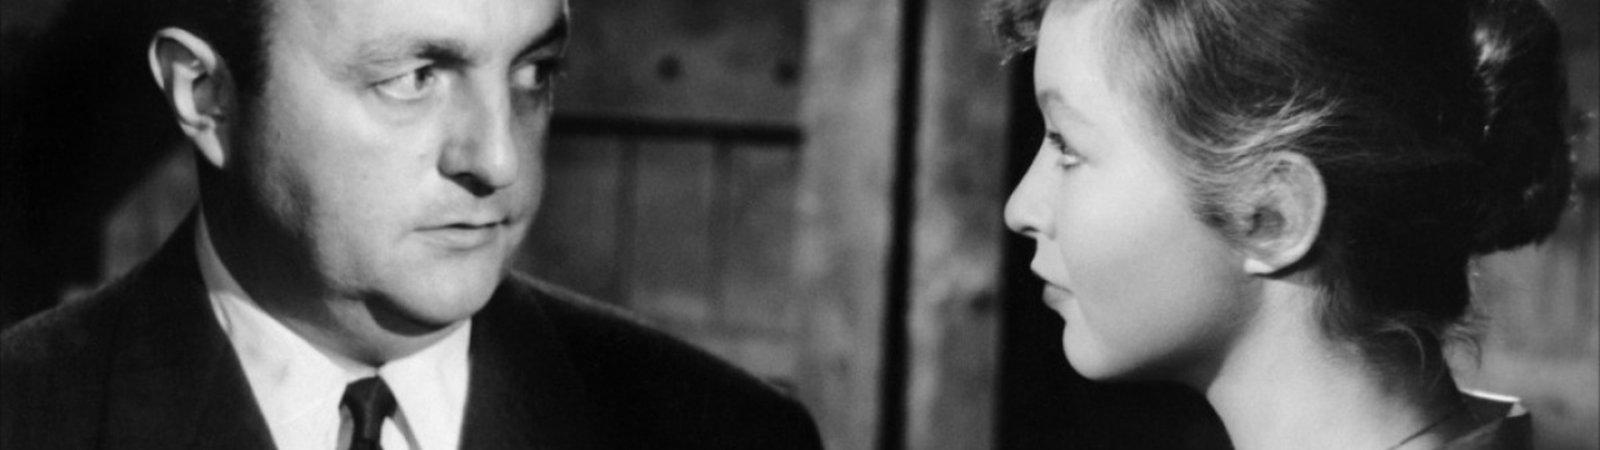 Photo dernier film Georges Lampin